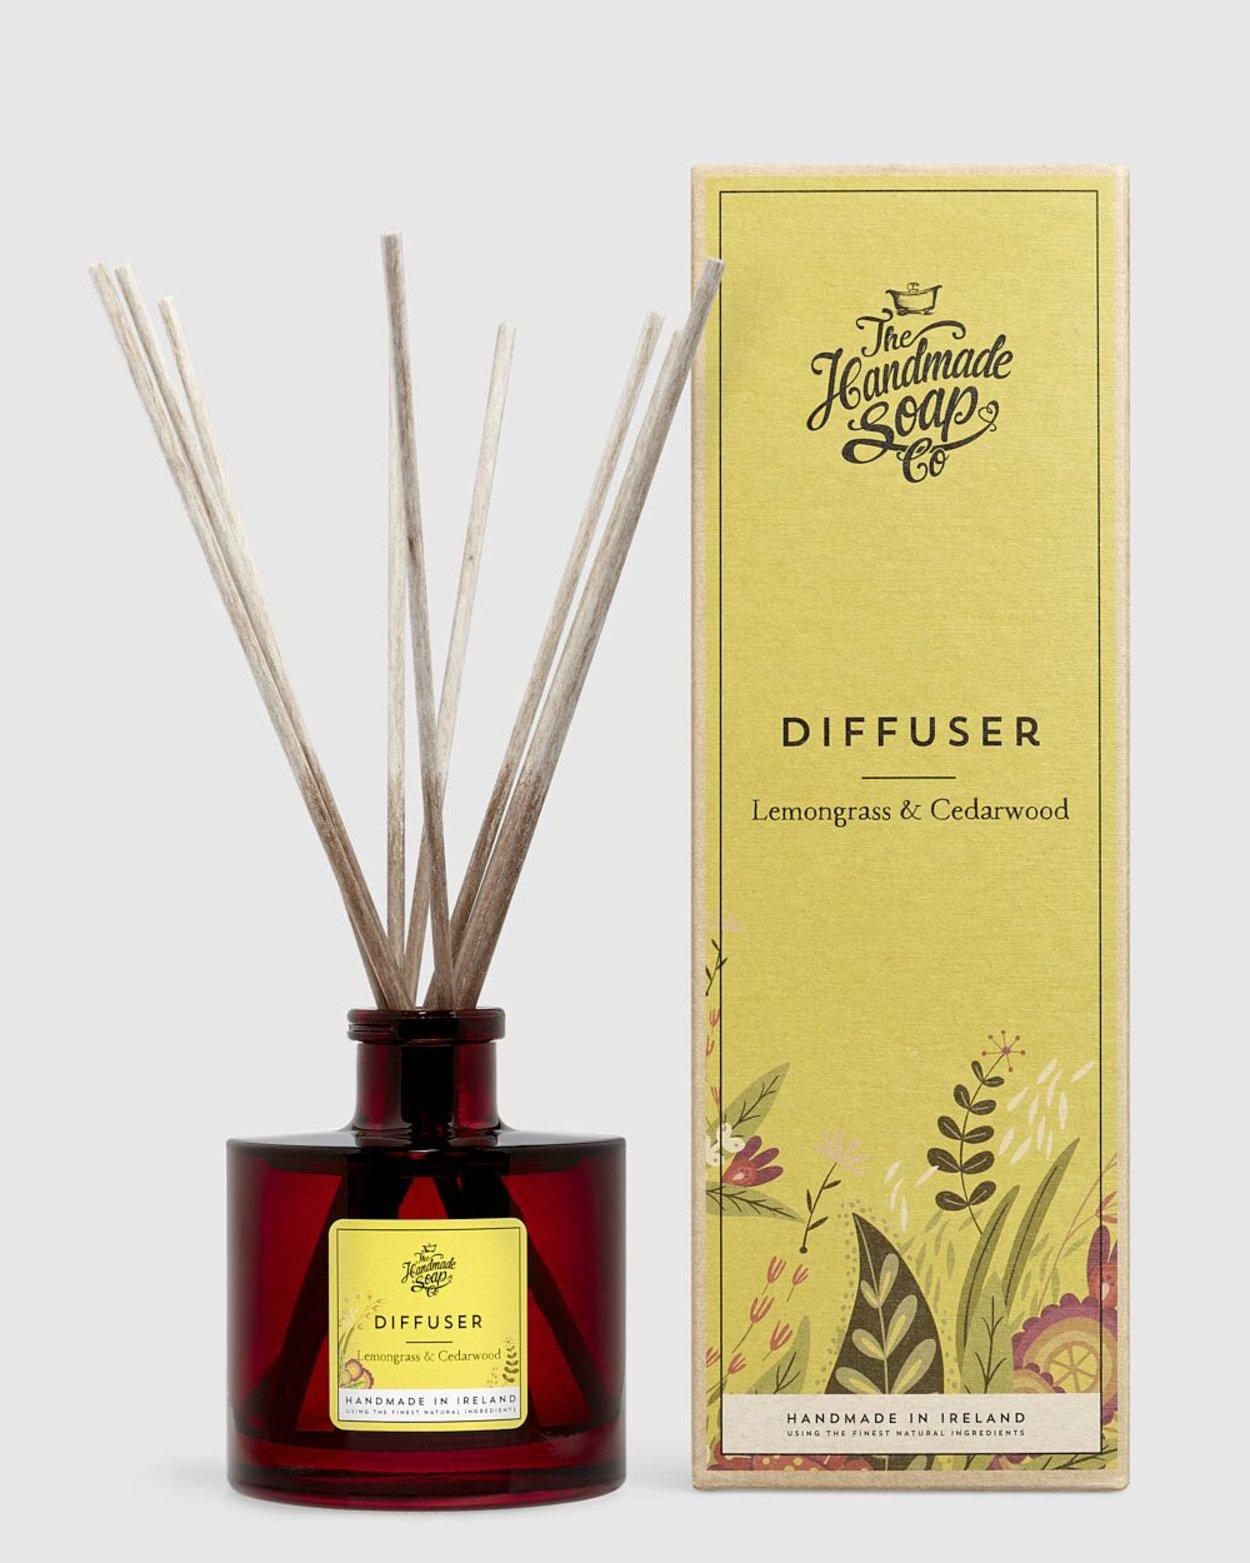 Lemongrass & Cedarwood Diffuser